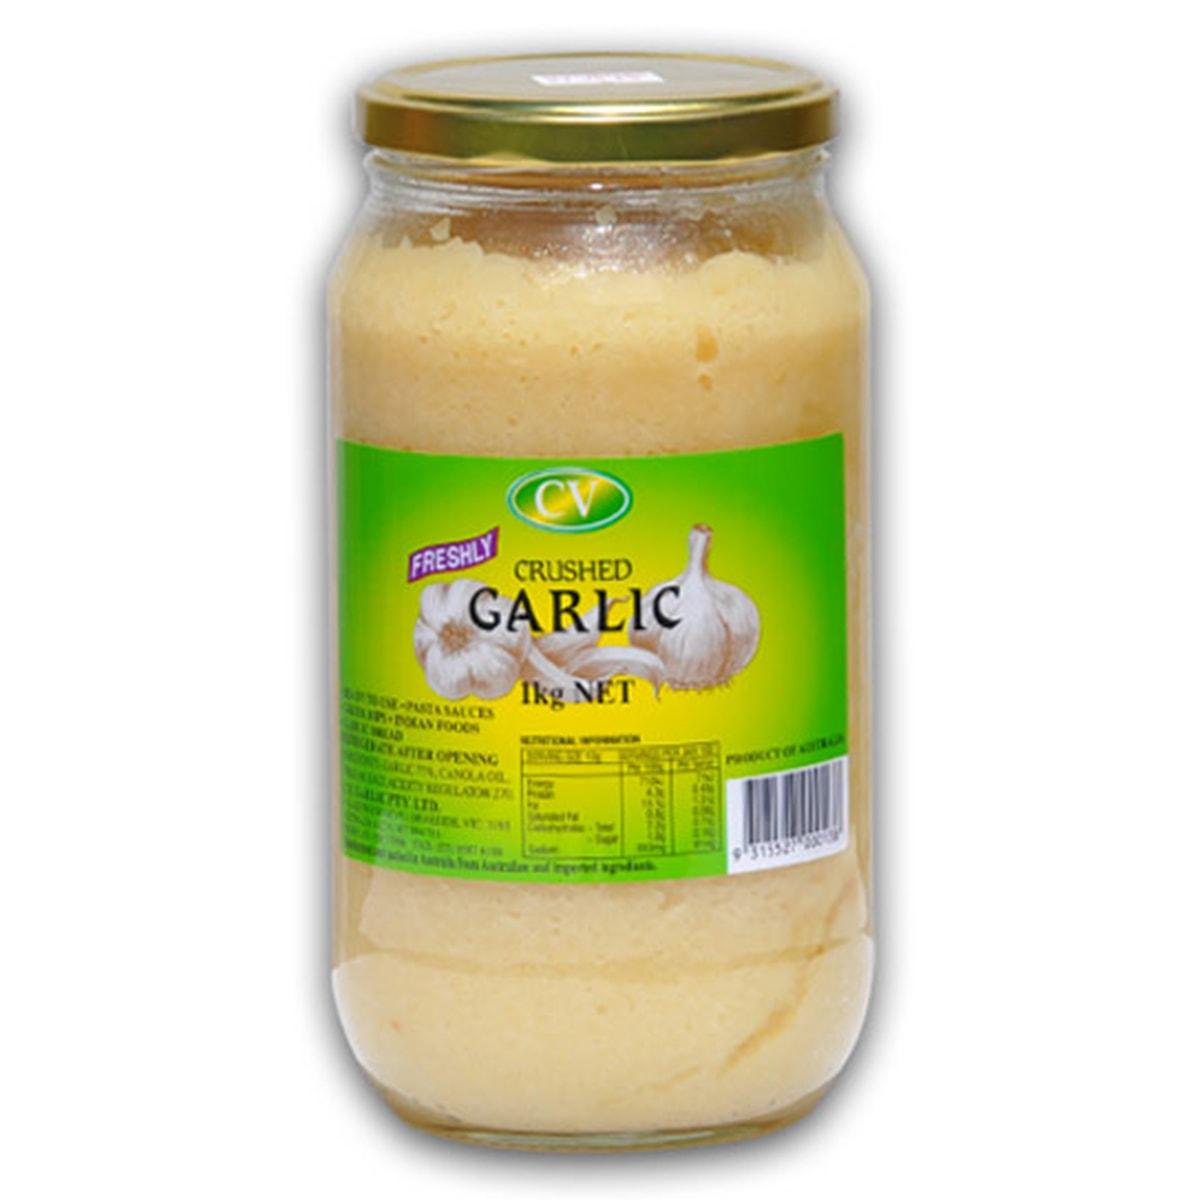 Buy CV Freshly Crushed Garlic Paste - 1 kg